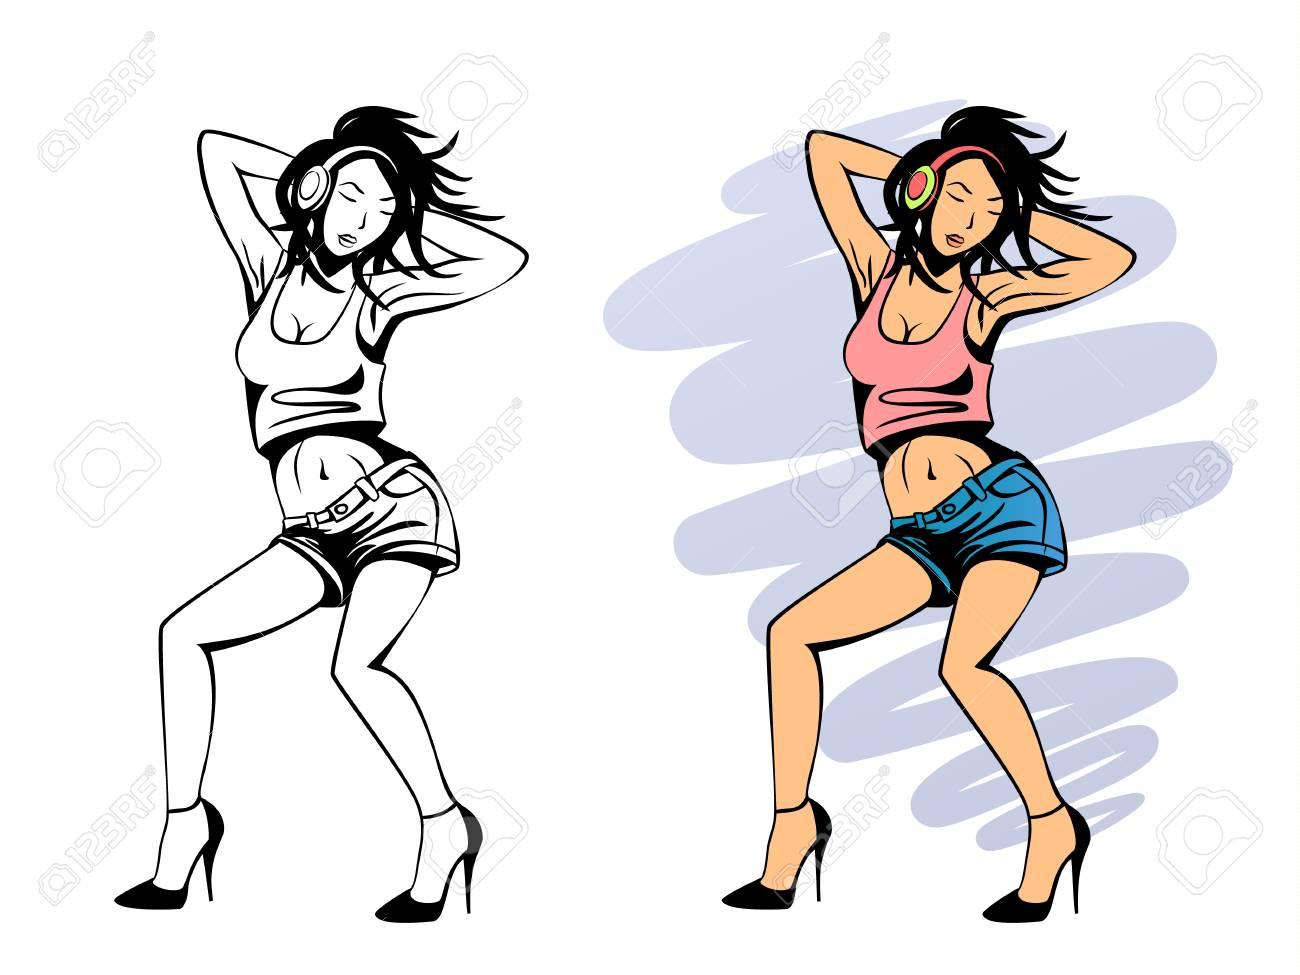 Vector illustration of dancing girl with headphones - 90922780